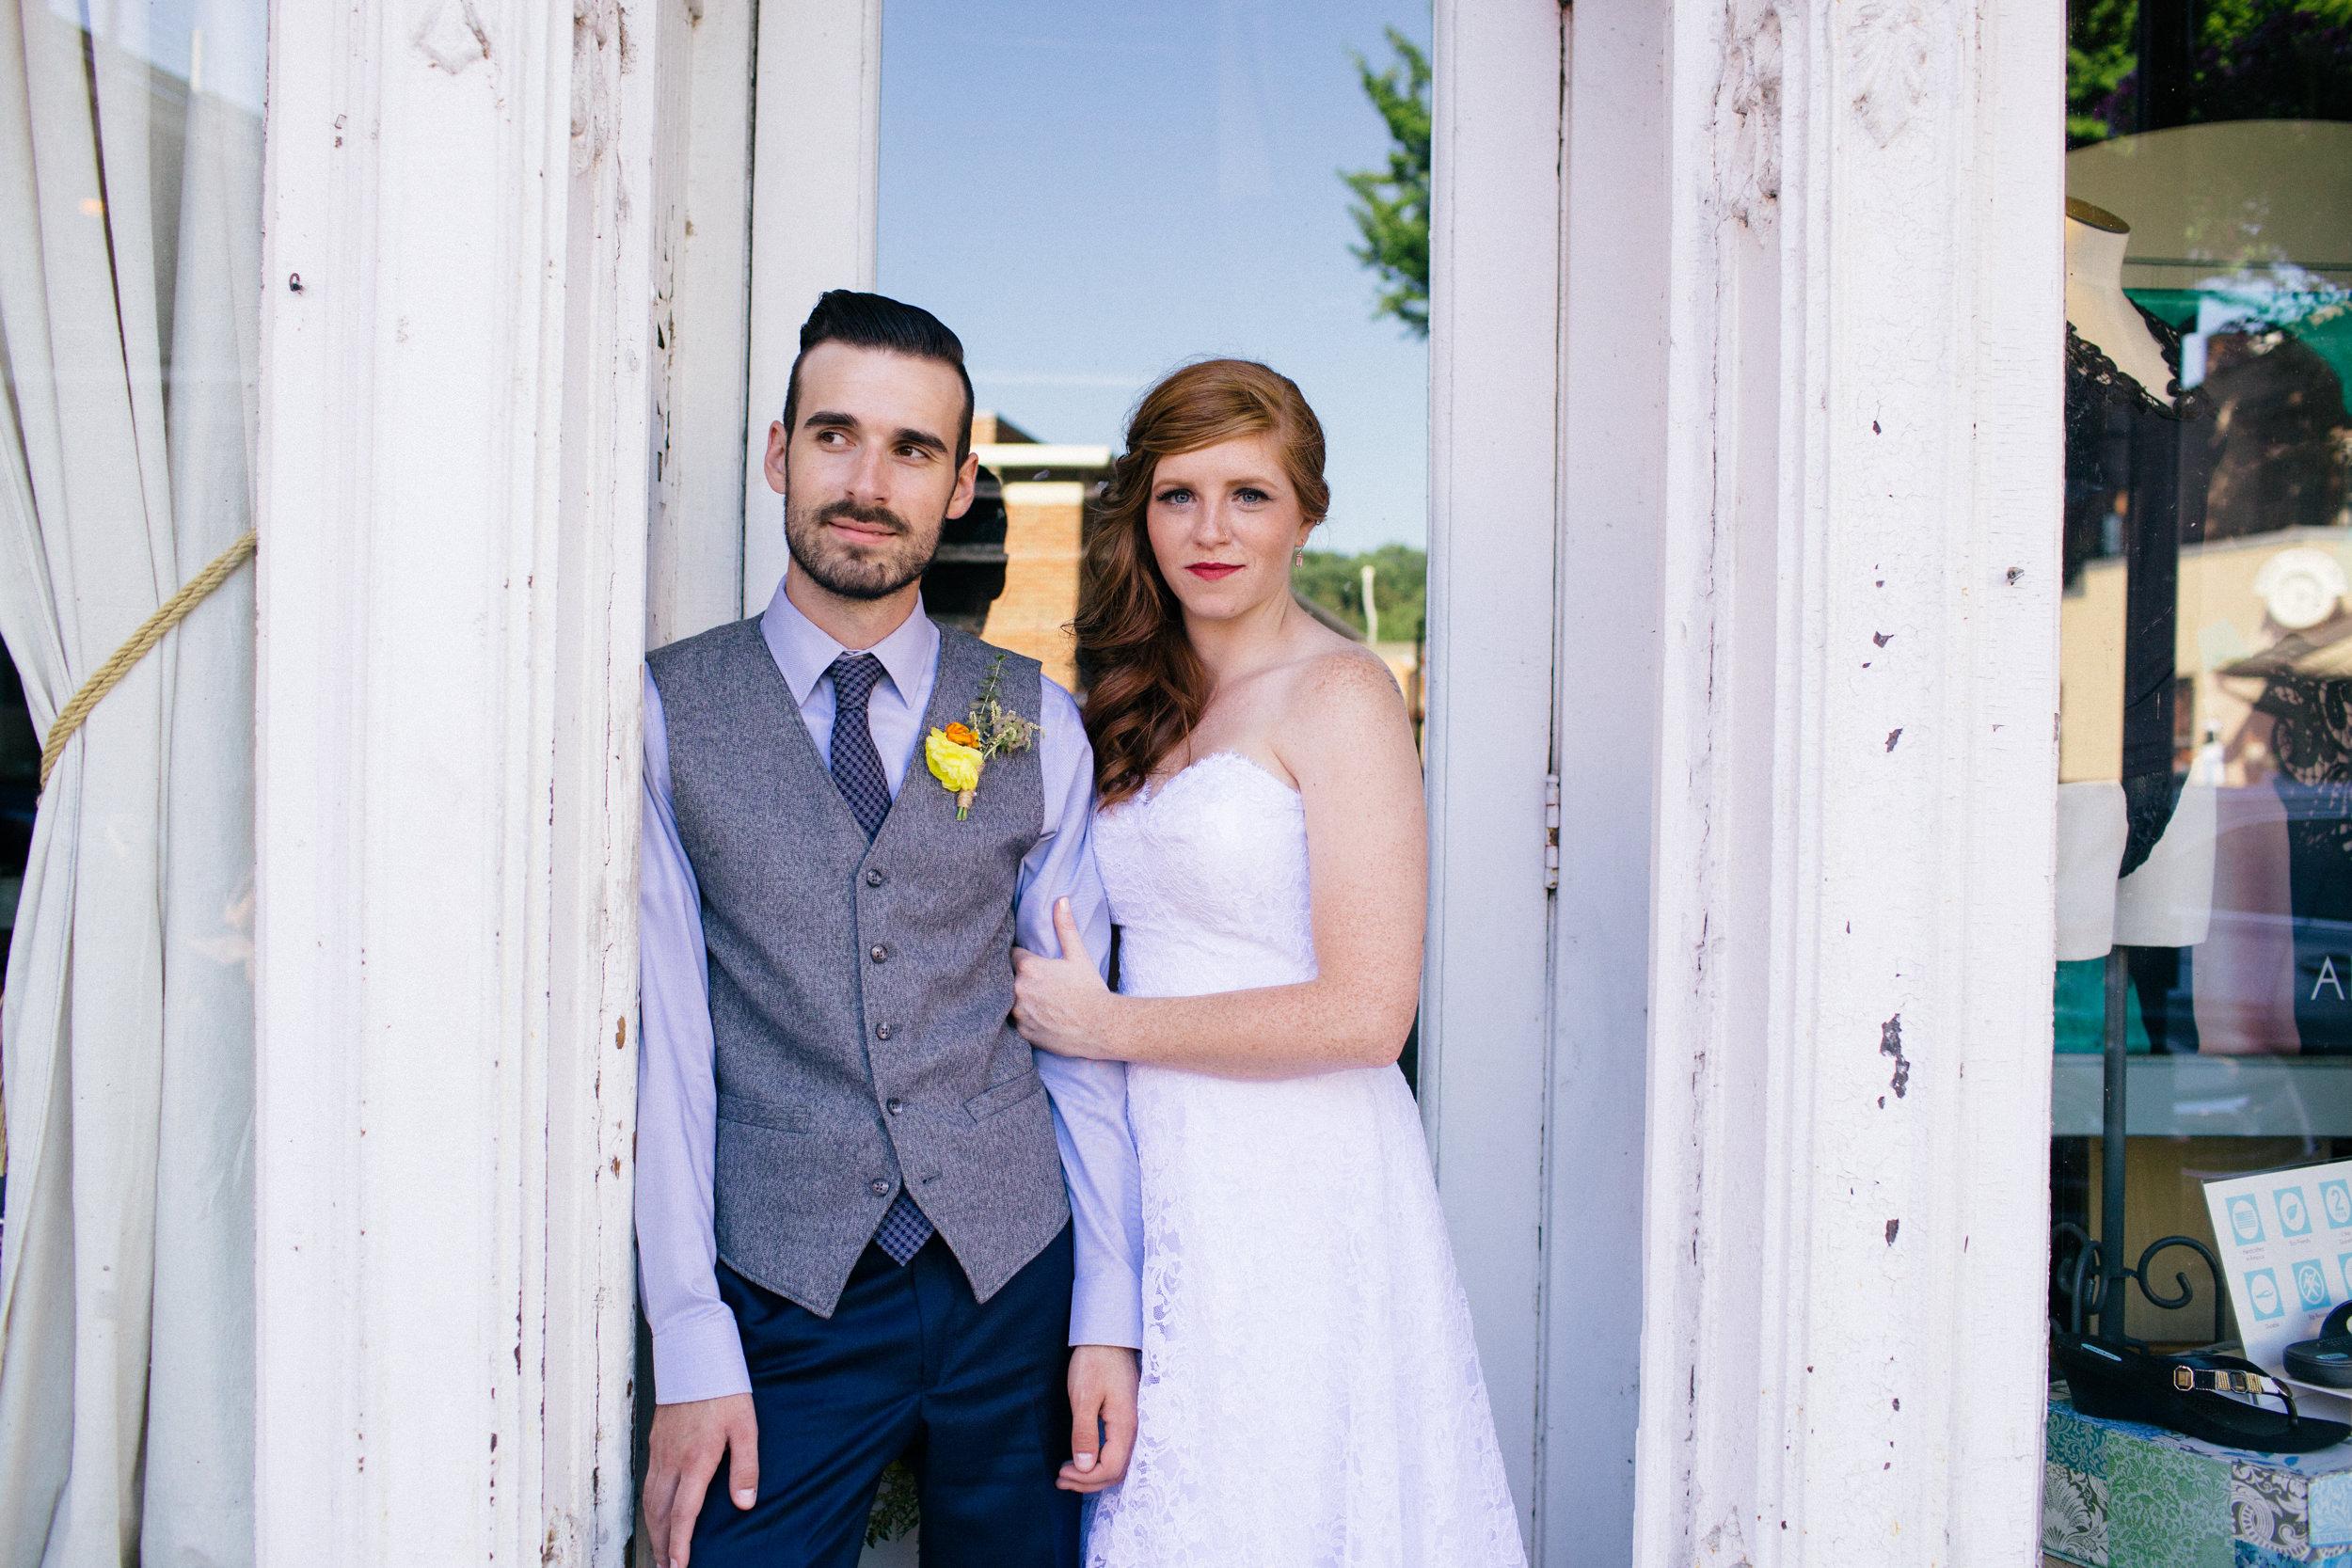 7-25-2015 Sarah and Jimmy's Eagle Ridge Downtown Galena Wedding-177.jpg